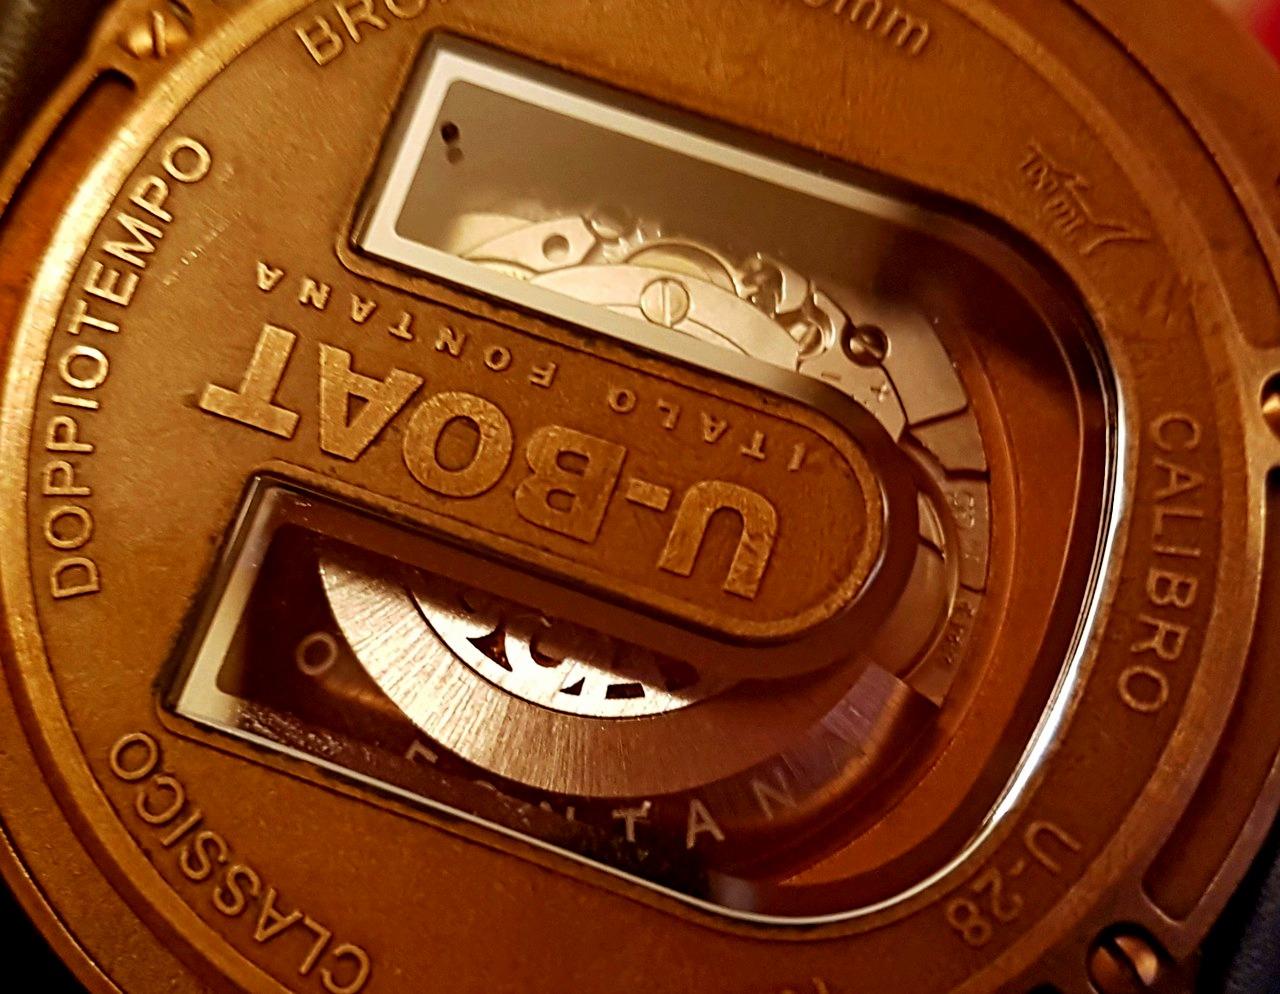 U-BOAT_9002 STRATOS 40 BK,9006 STRATOS 45 BK, SOMMERSO, 9008 - 9088 DOPPIO TEMPO AUTO BRONZO ECHIMERA 46 BRONZO SAPPHIRE LIMITED EDITION _prezzo_price_0-10019